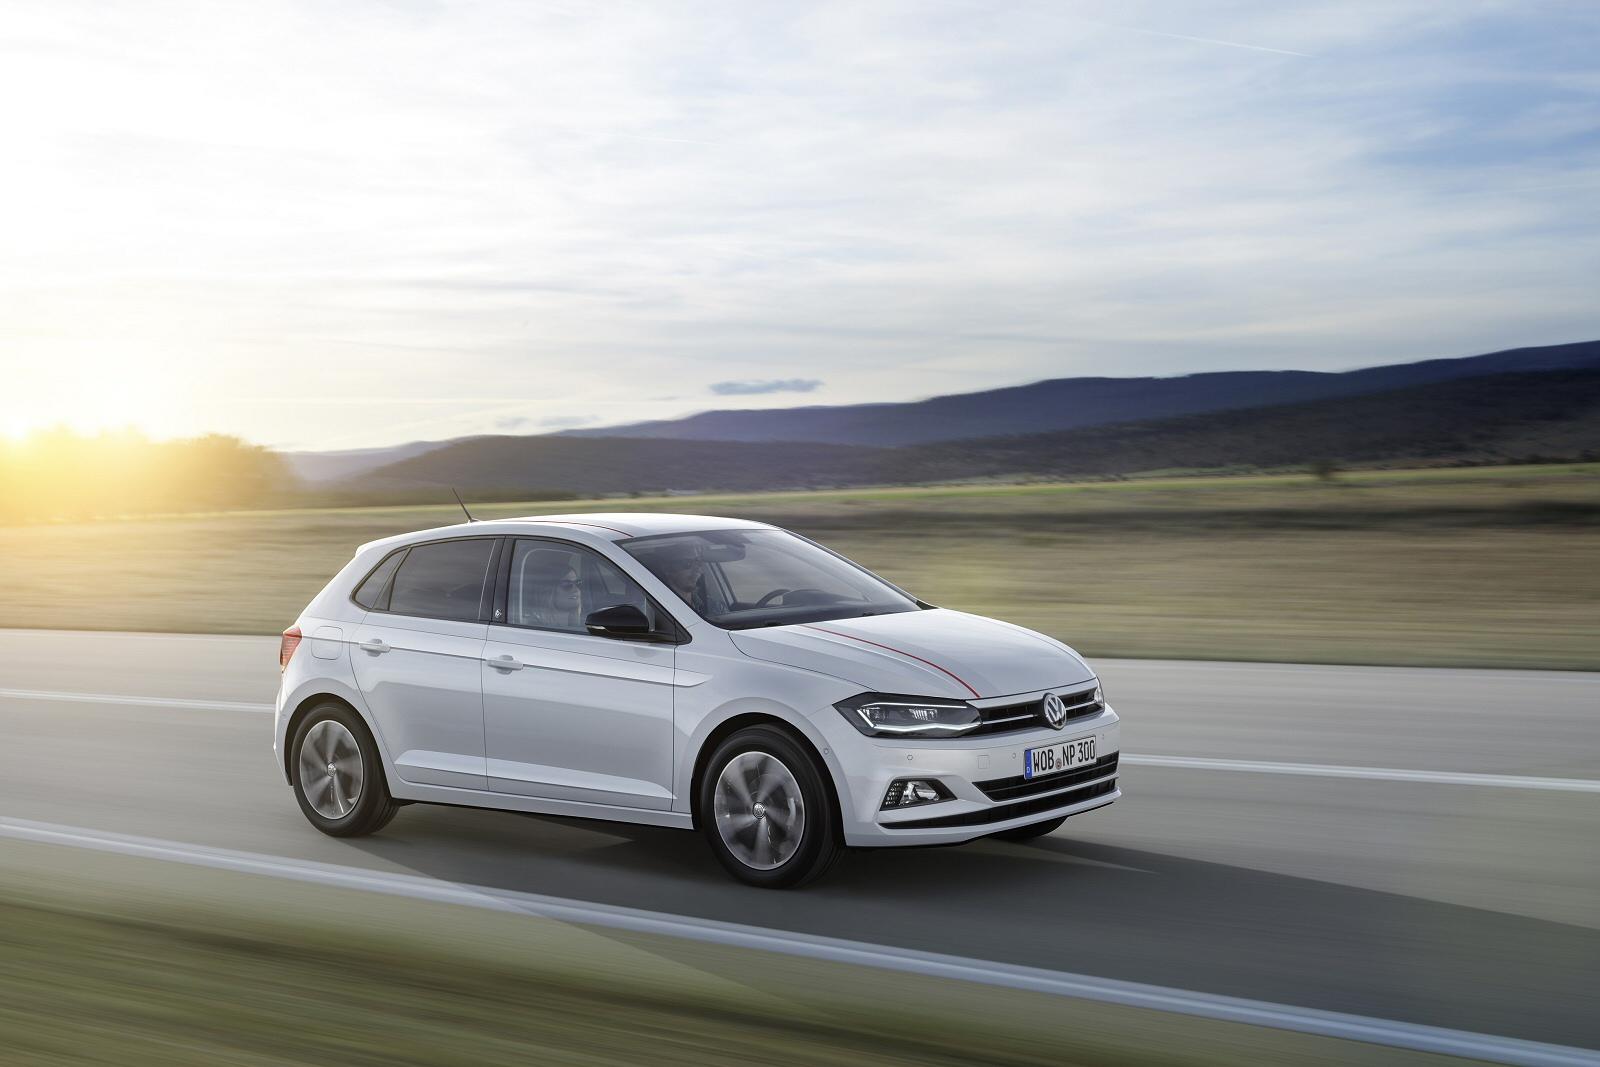 c8b0558ad207b New Volkswagen Polo 1.0 TSI 95 SE 5dr Petrol Hatchback for Sale ...